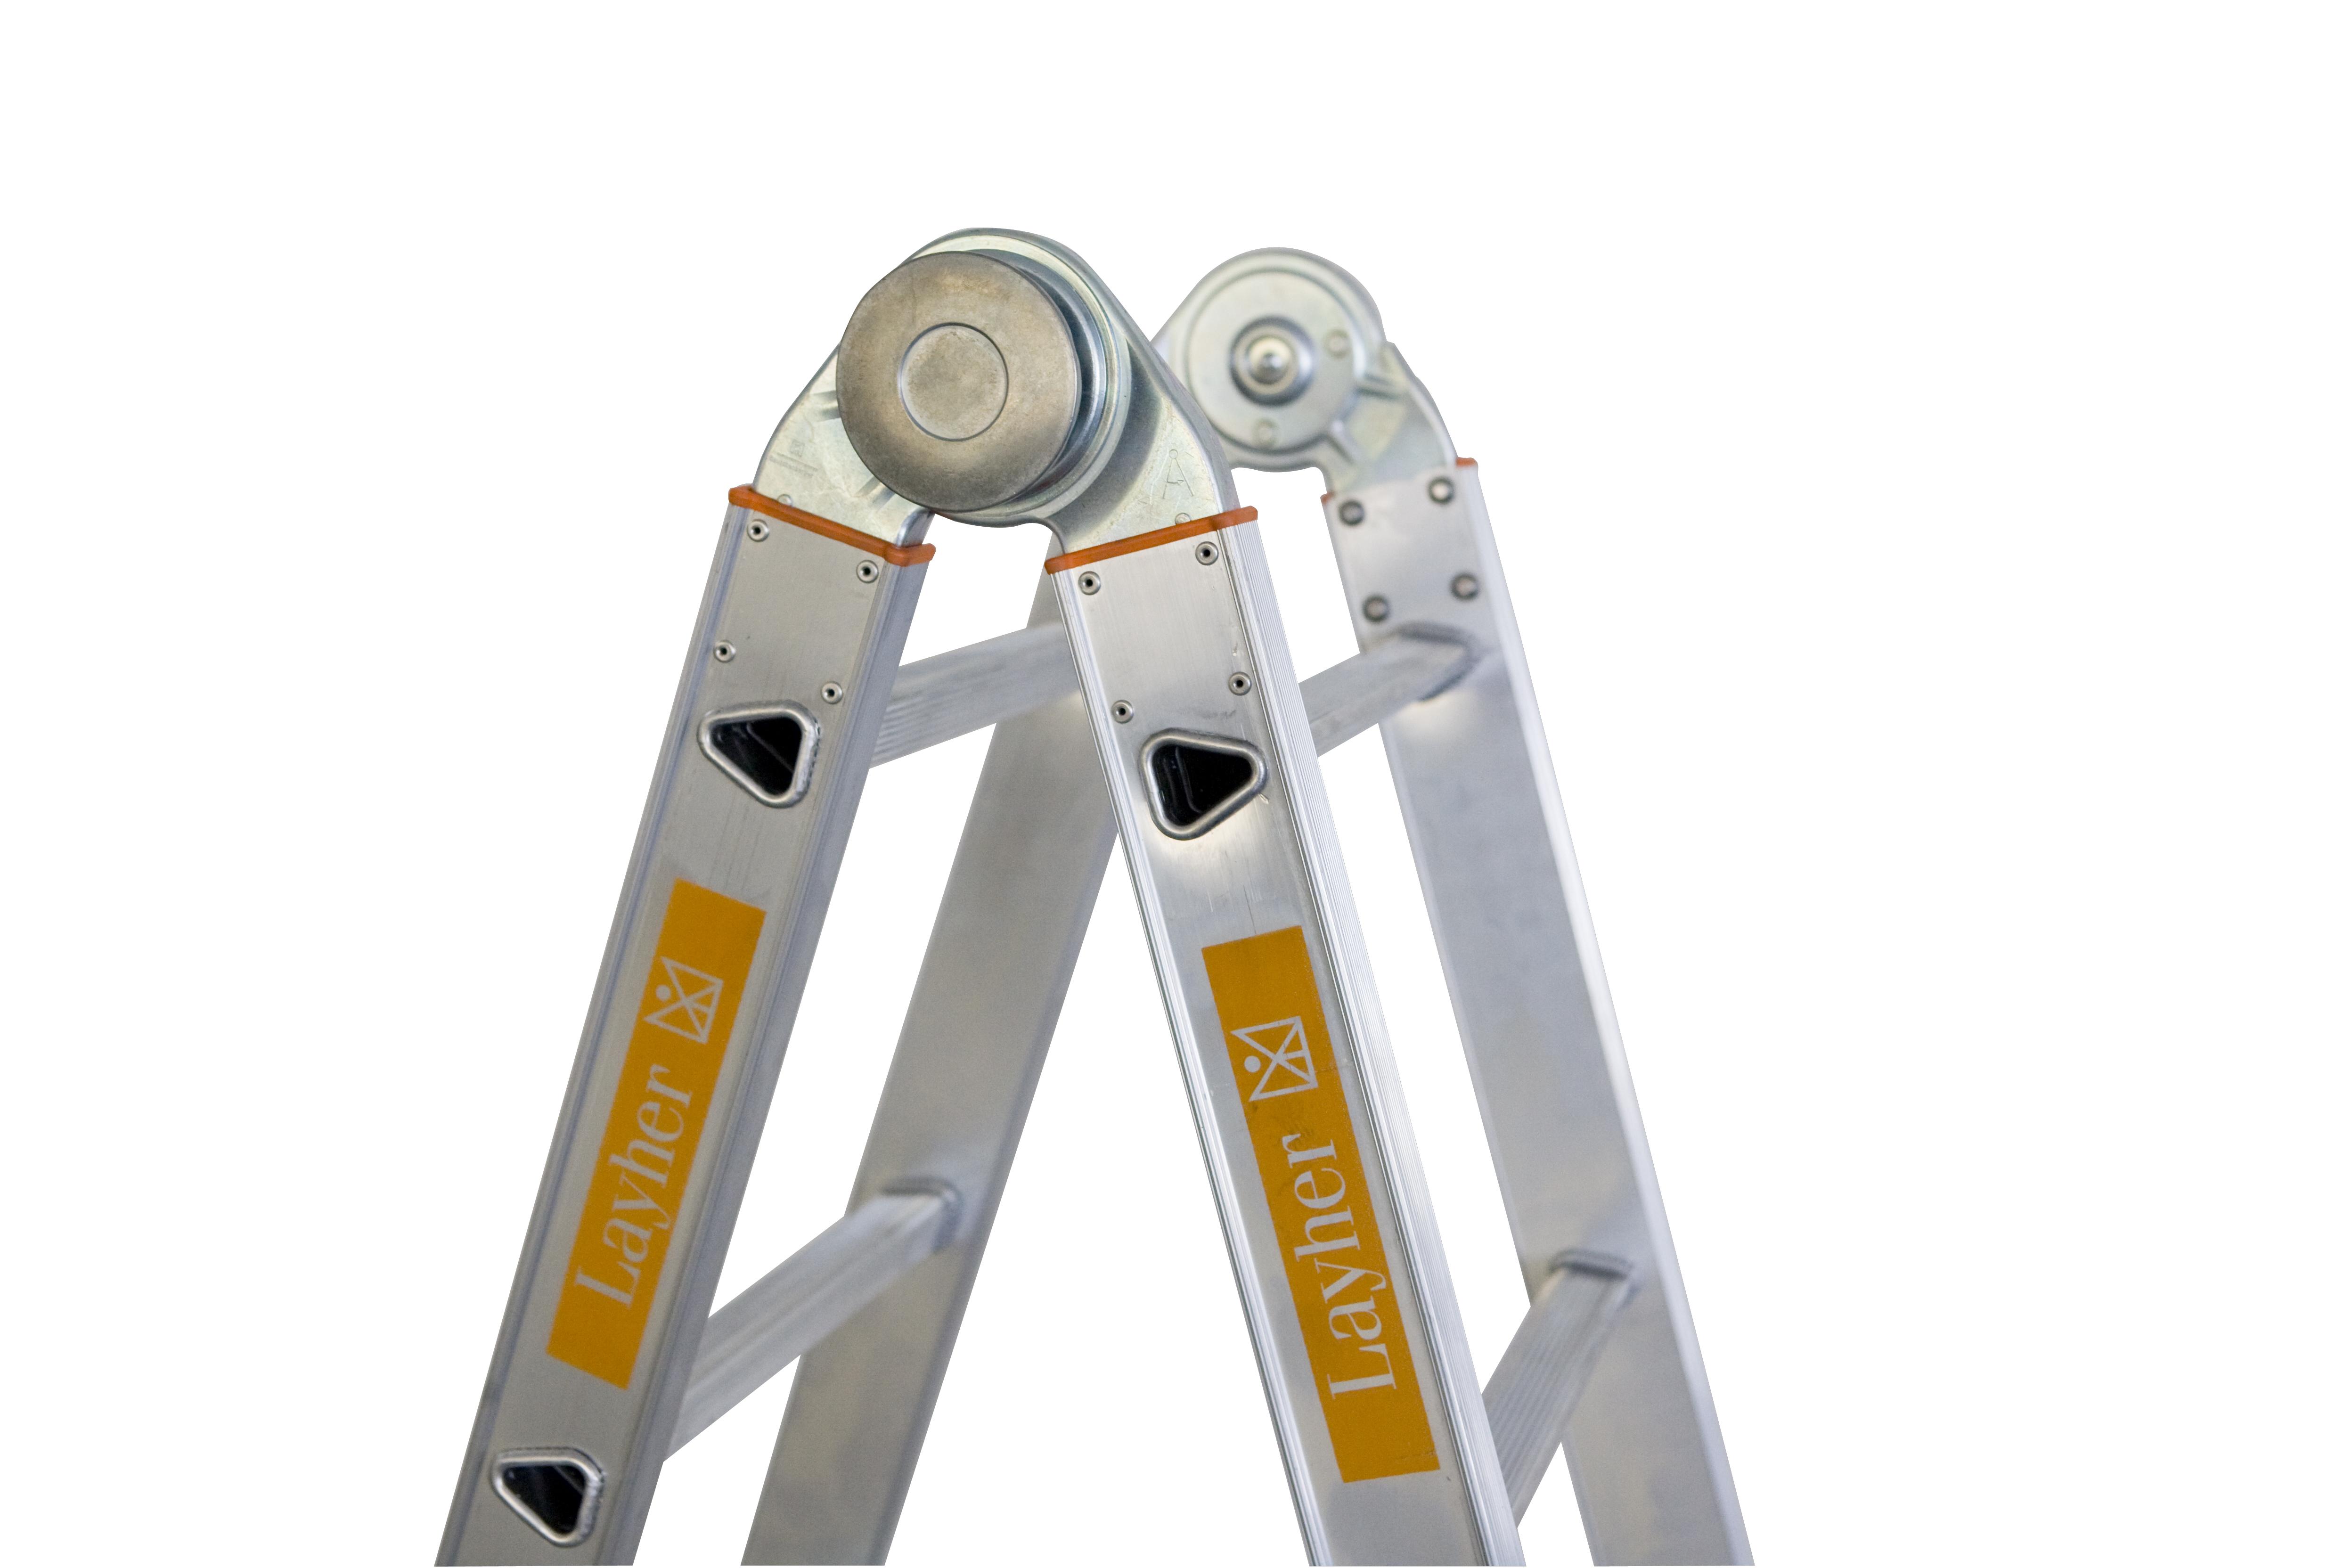 King ladder profi leiter meter aluminium teleskopleiter